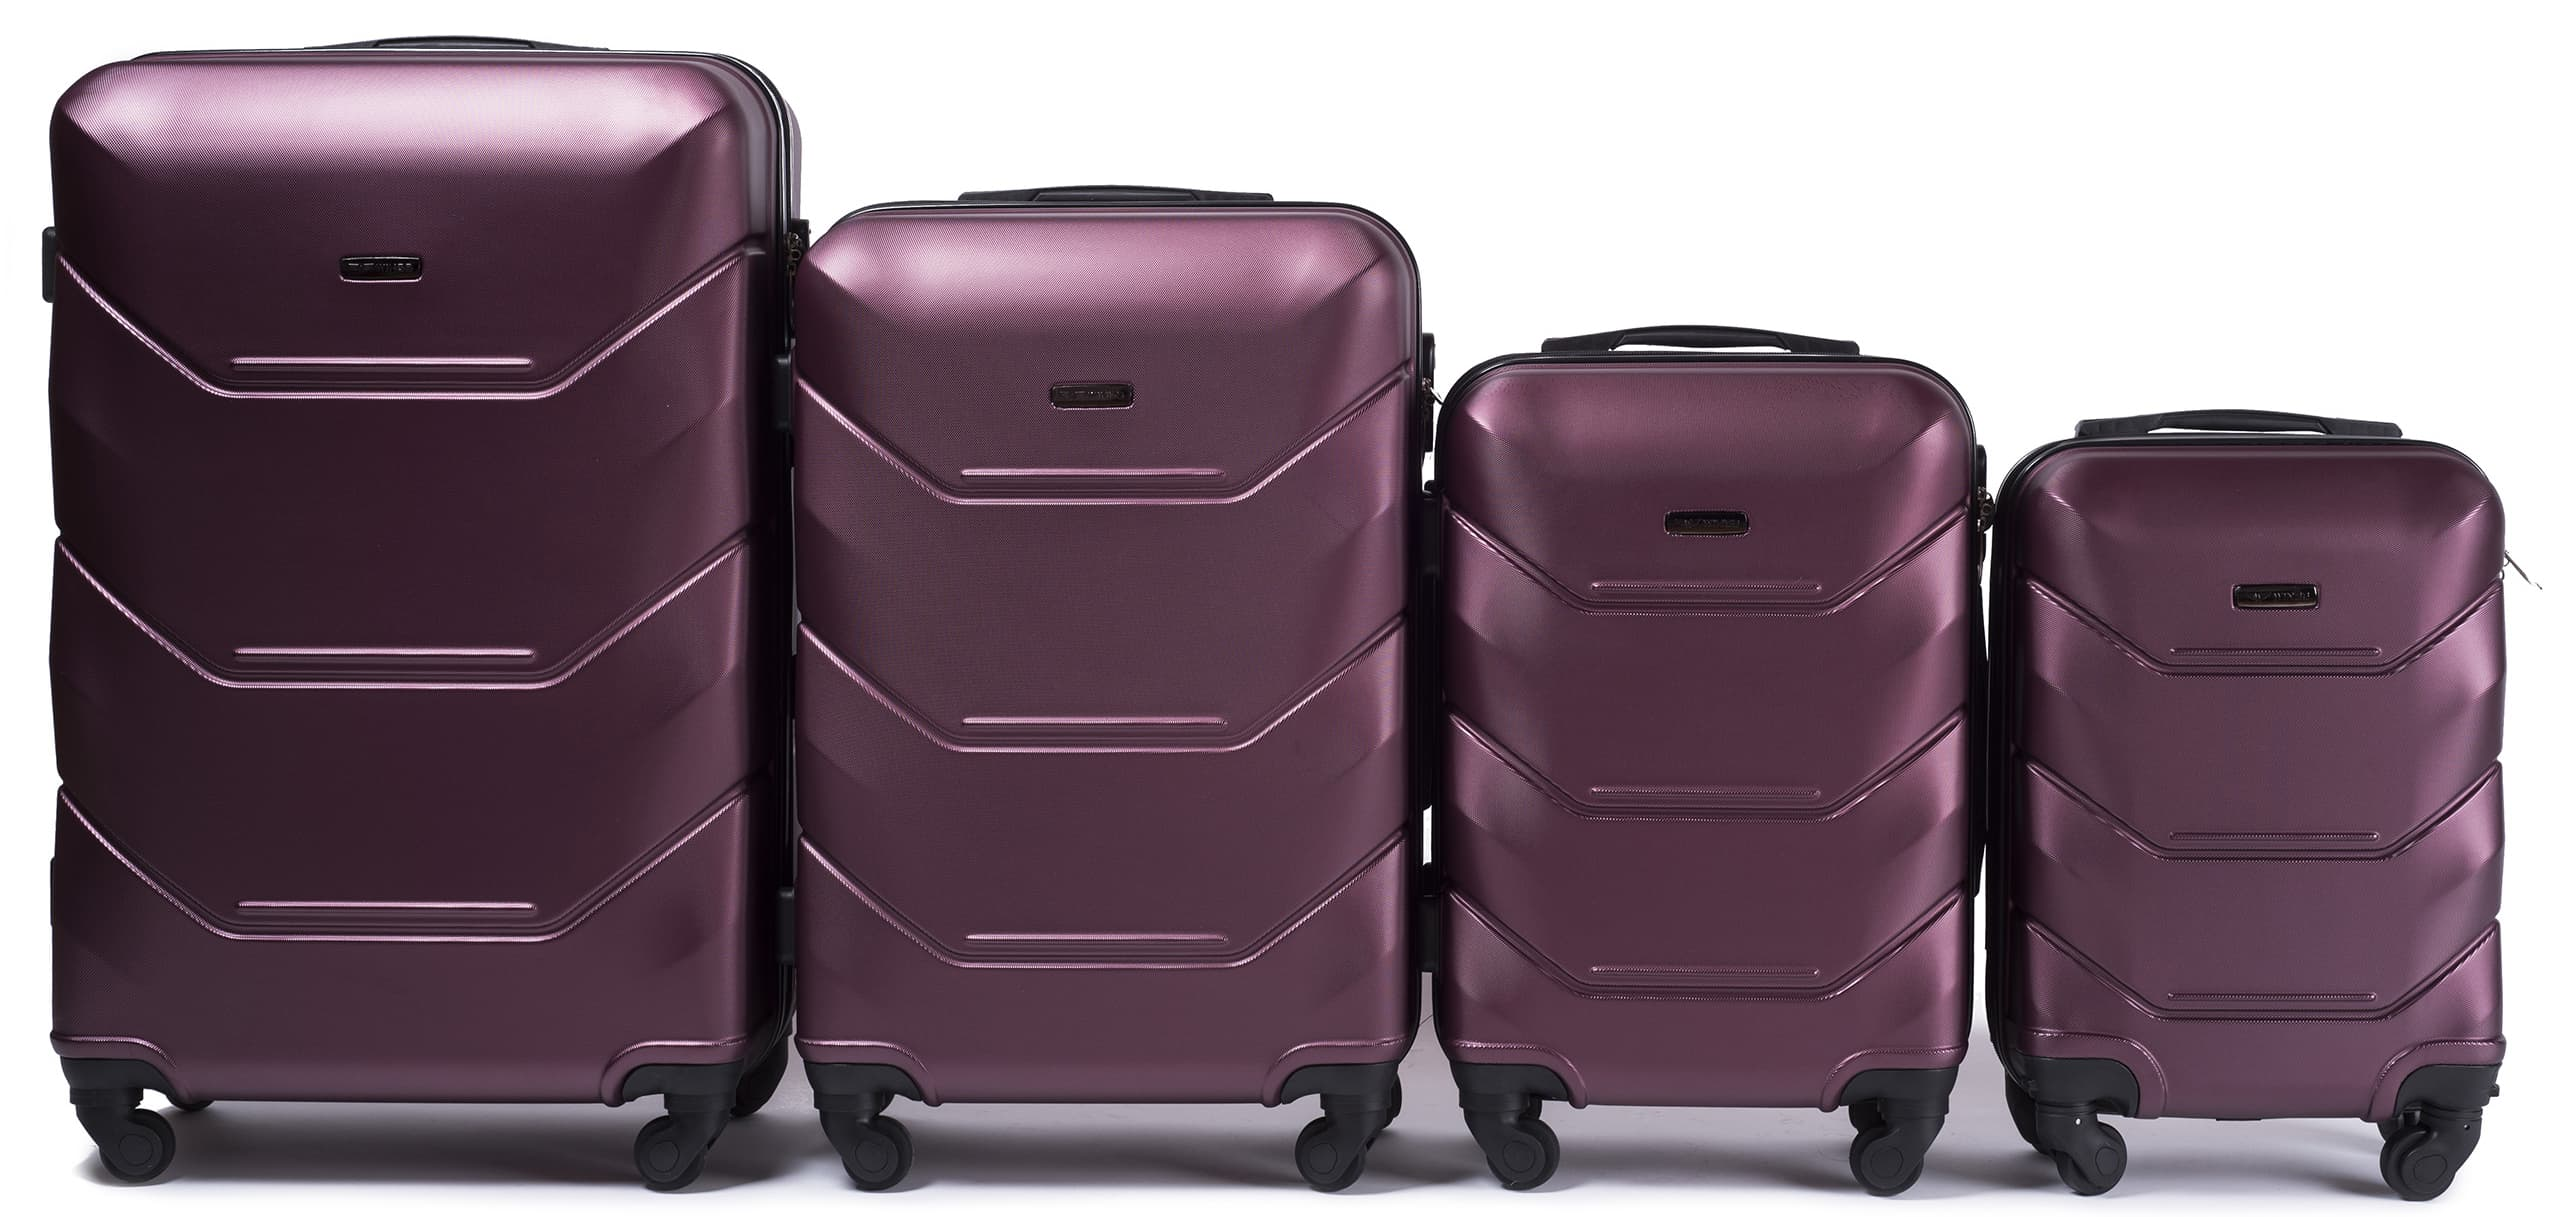 Set de valize din ABS Policarbonat pe 4 roti! Rezistente si usoare! 147 SET BURGUNDY